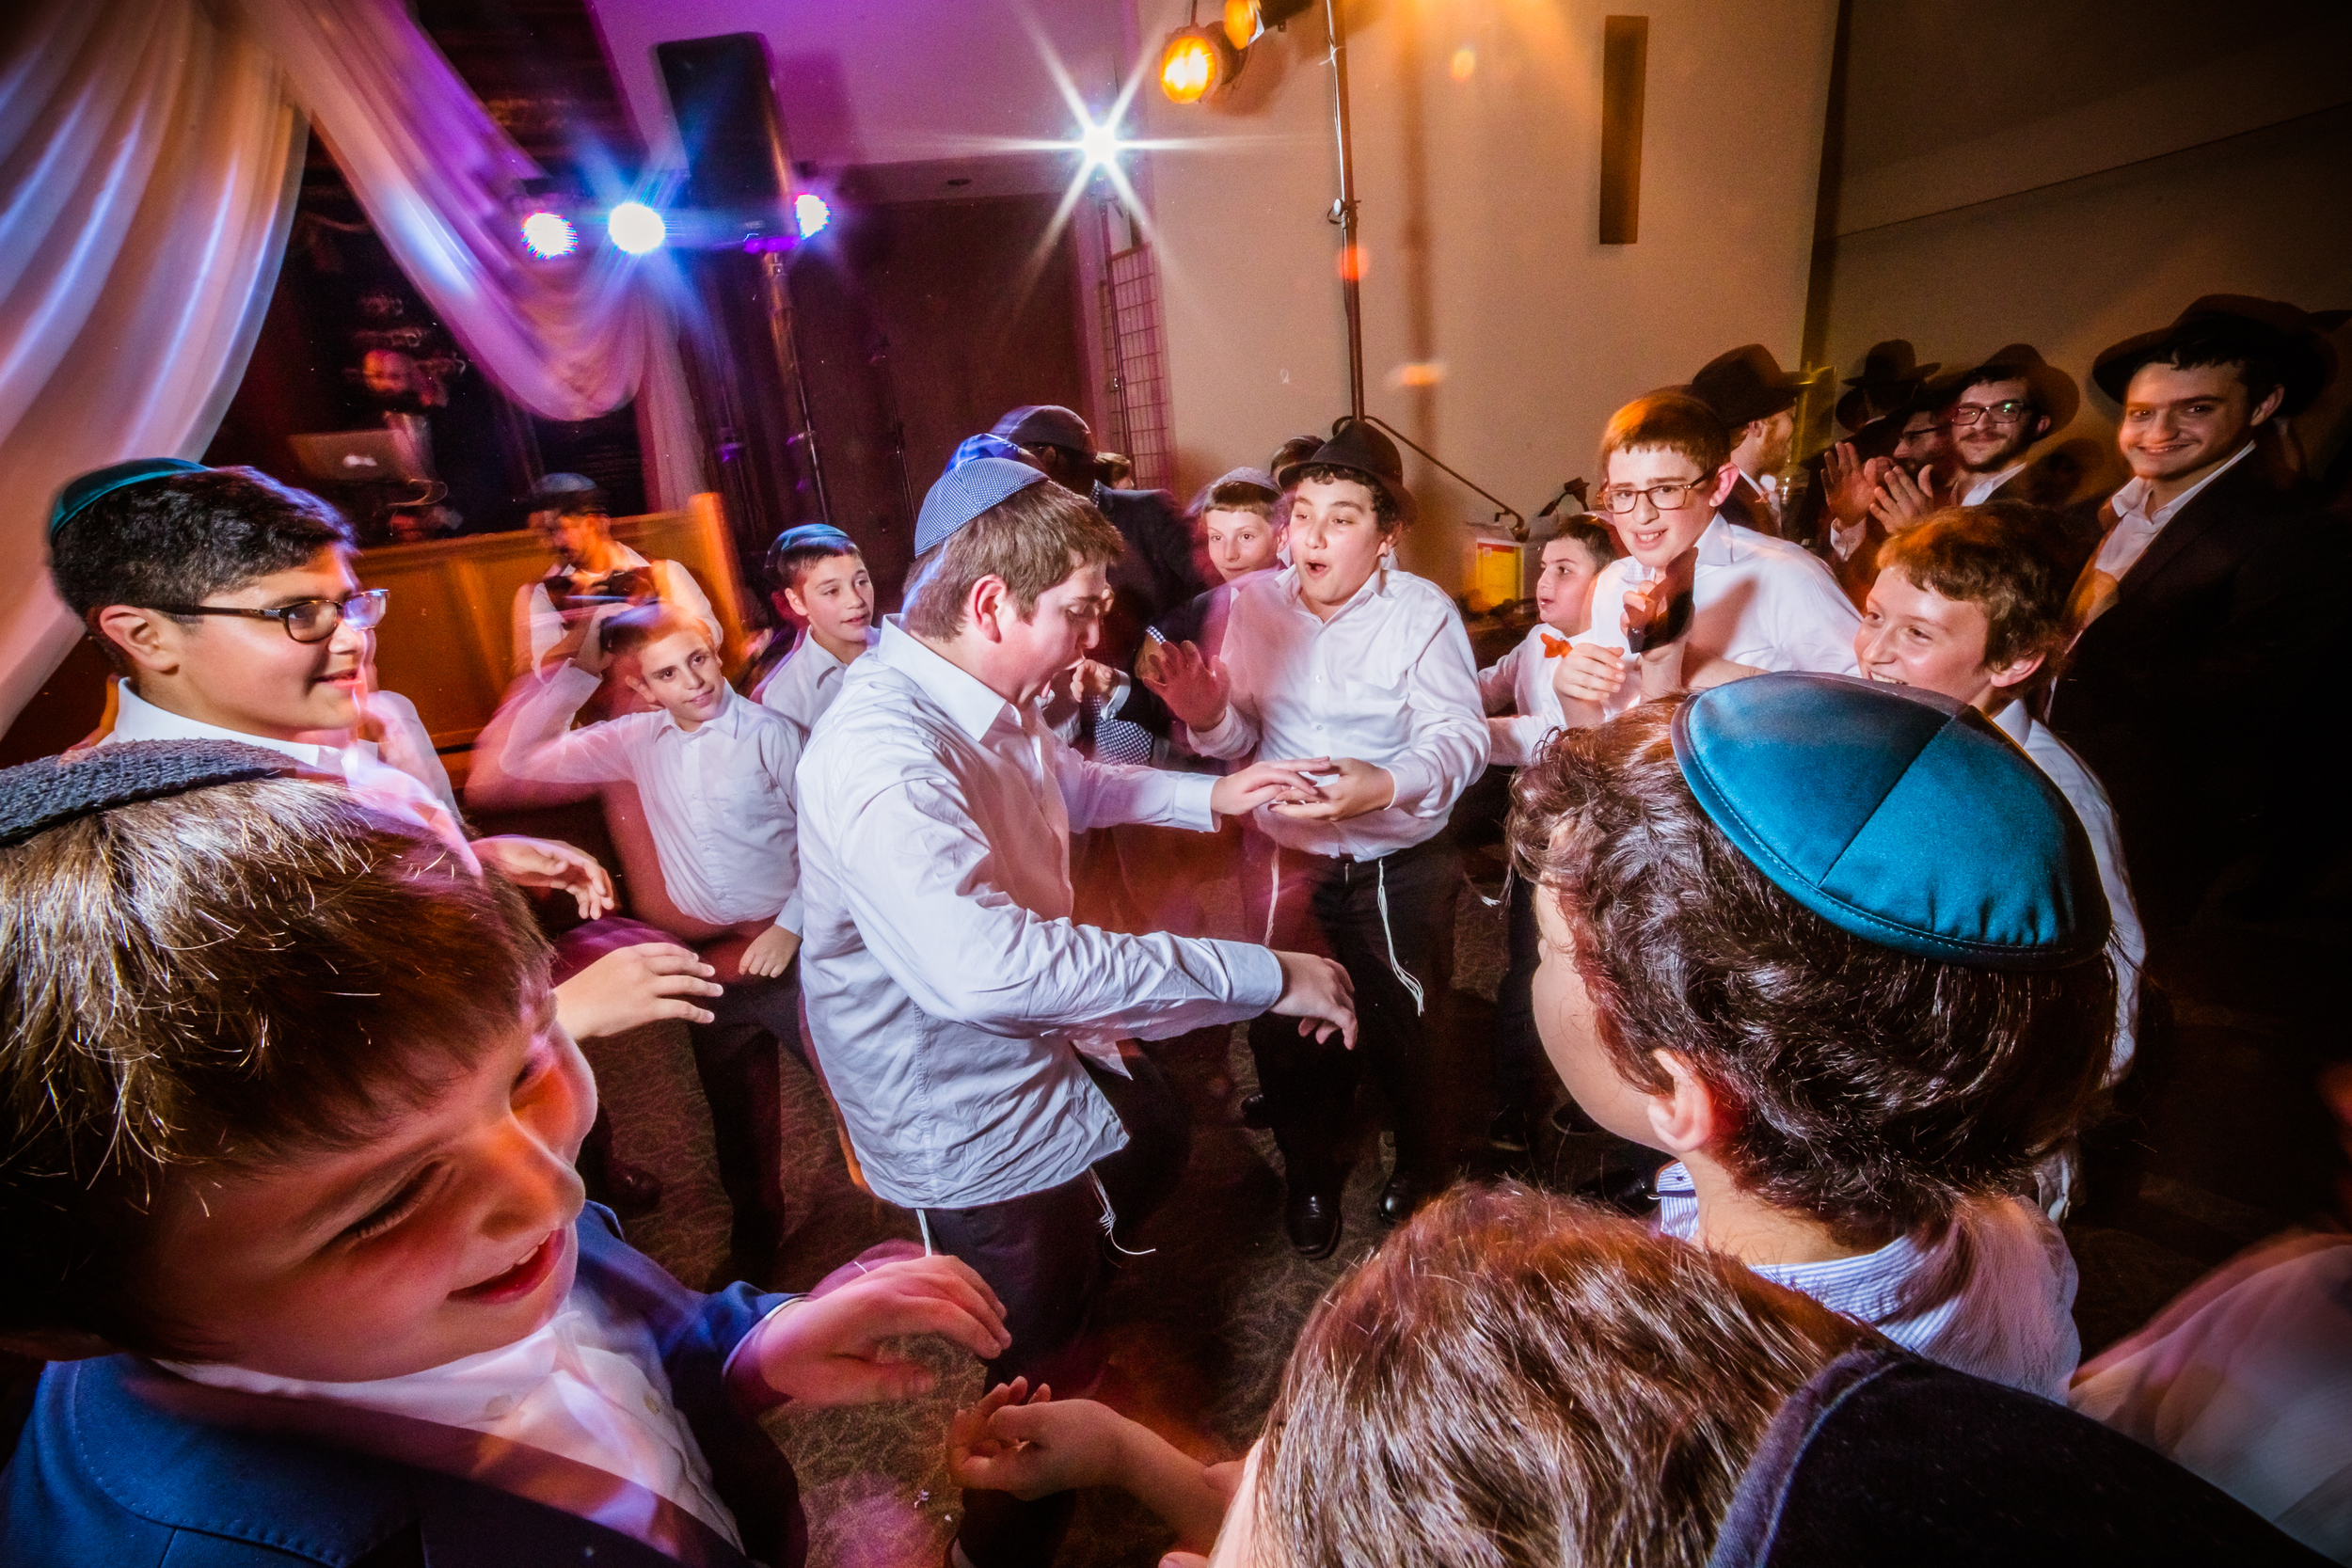 Bar Mitzvah Y. Sandman - Eliau Piha studio photography, new york, events, people-0316.jpg